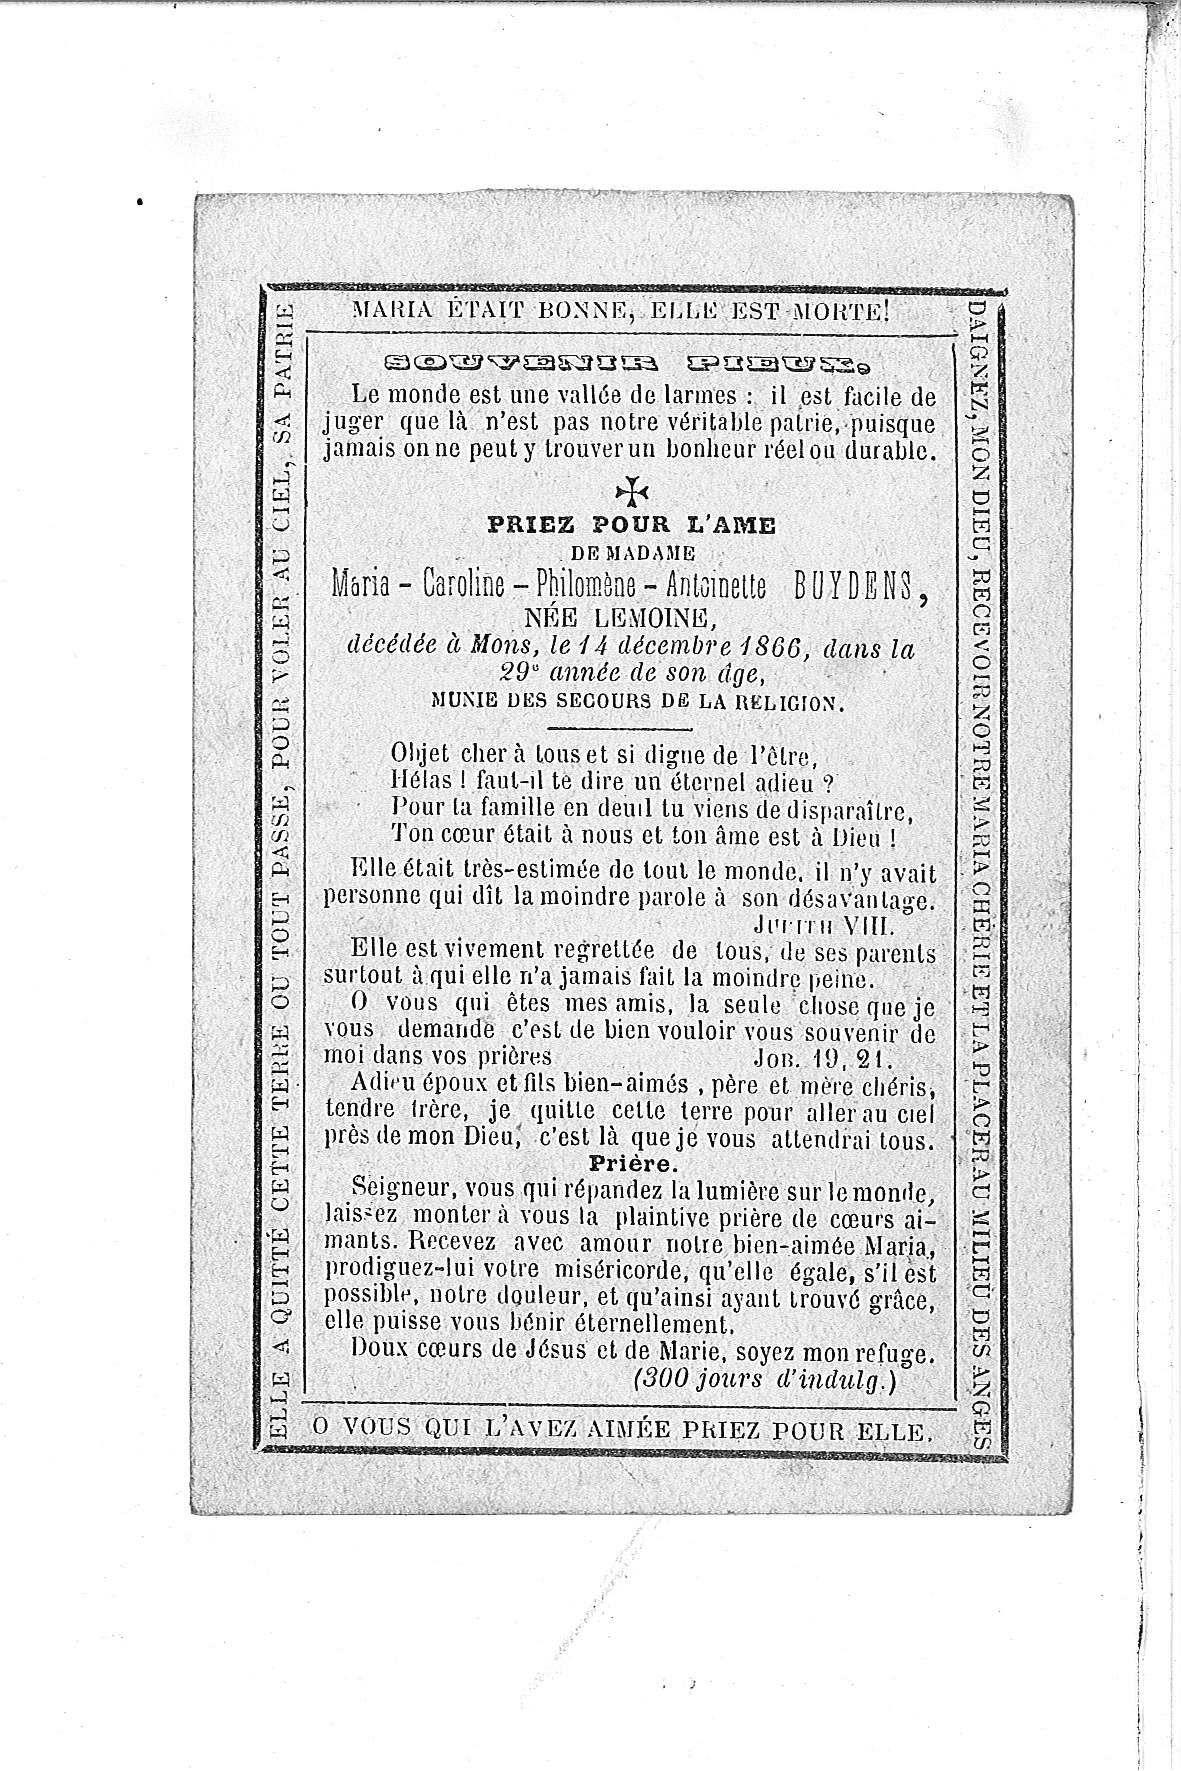 maria-caroline-philomène-antoinette(1866)20101014085217_00007.jpg